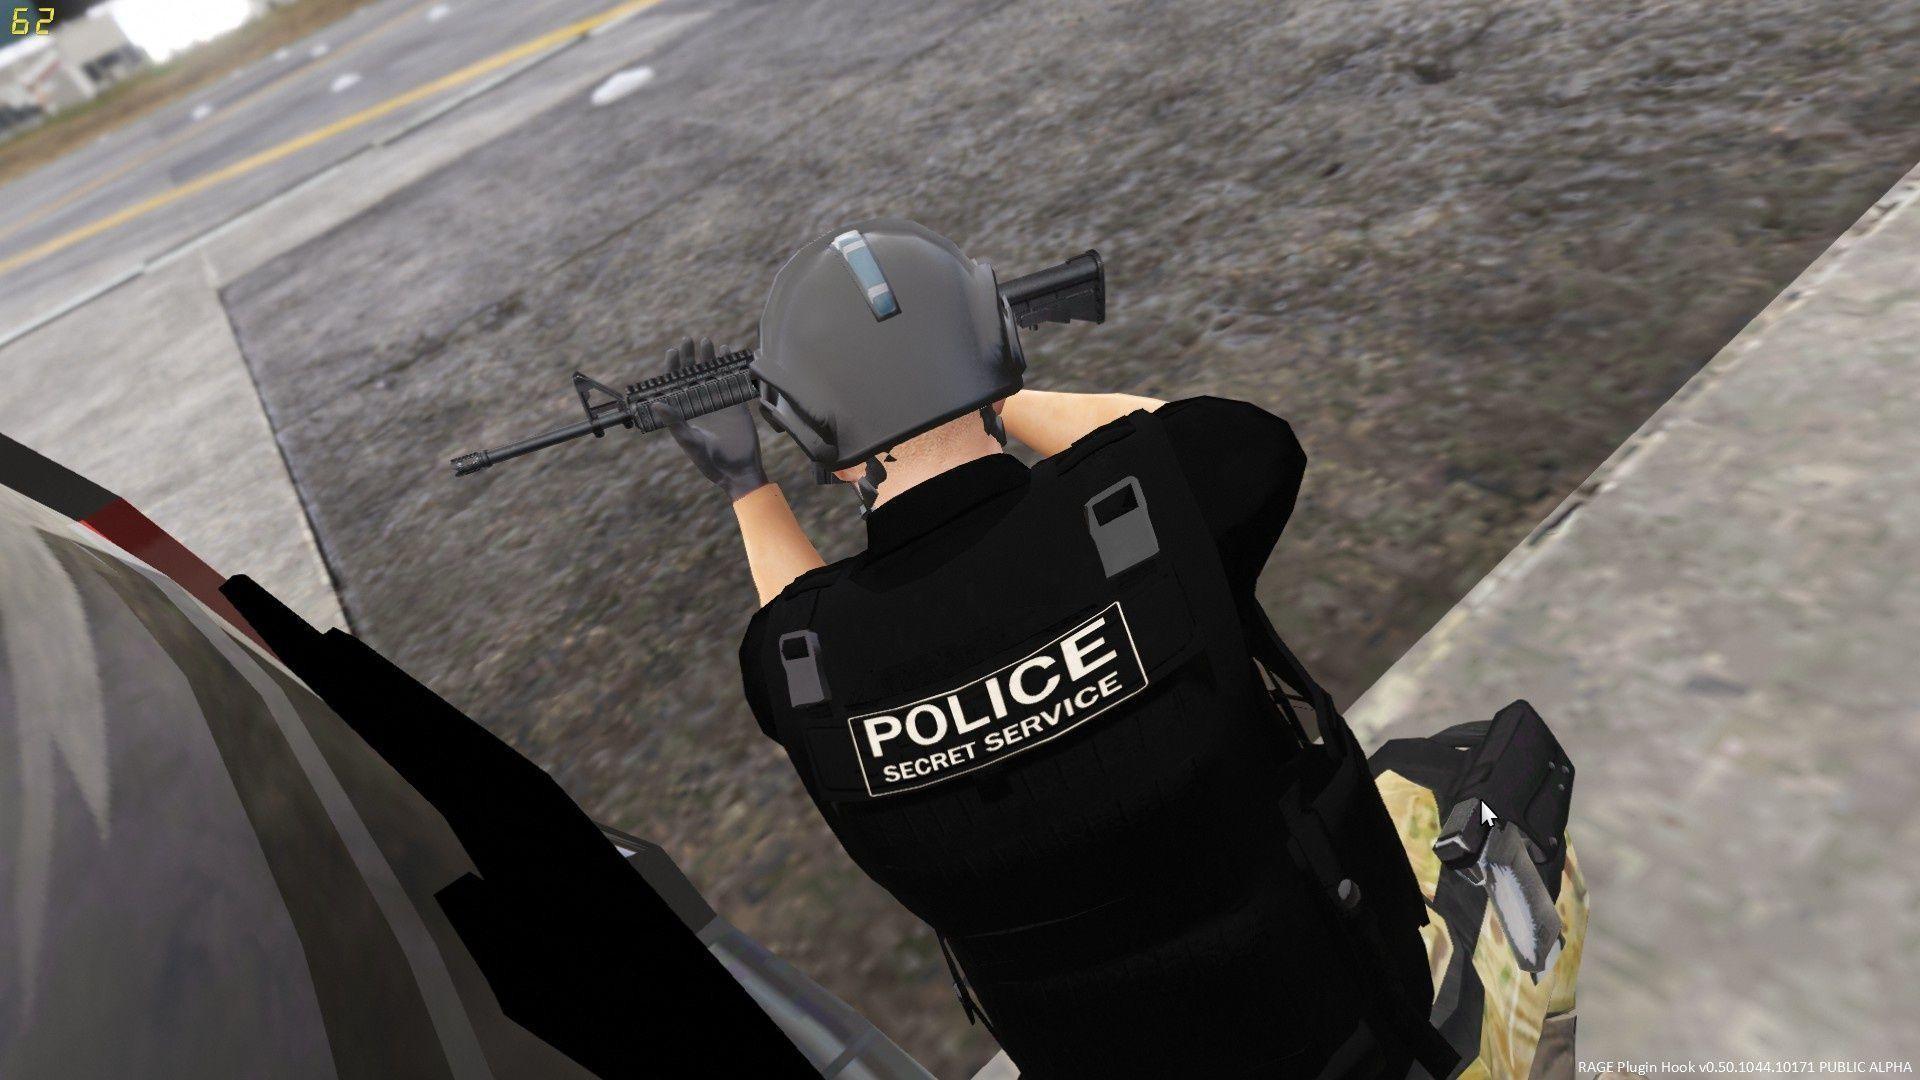 Res: 1920x1080, United States Secret Service Counter Assault Team (U.S.S.S. C.A.T. .